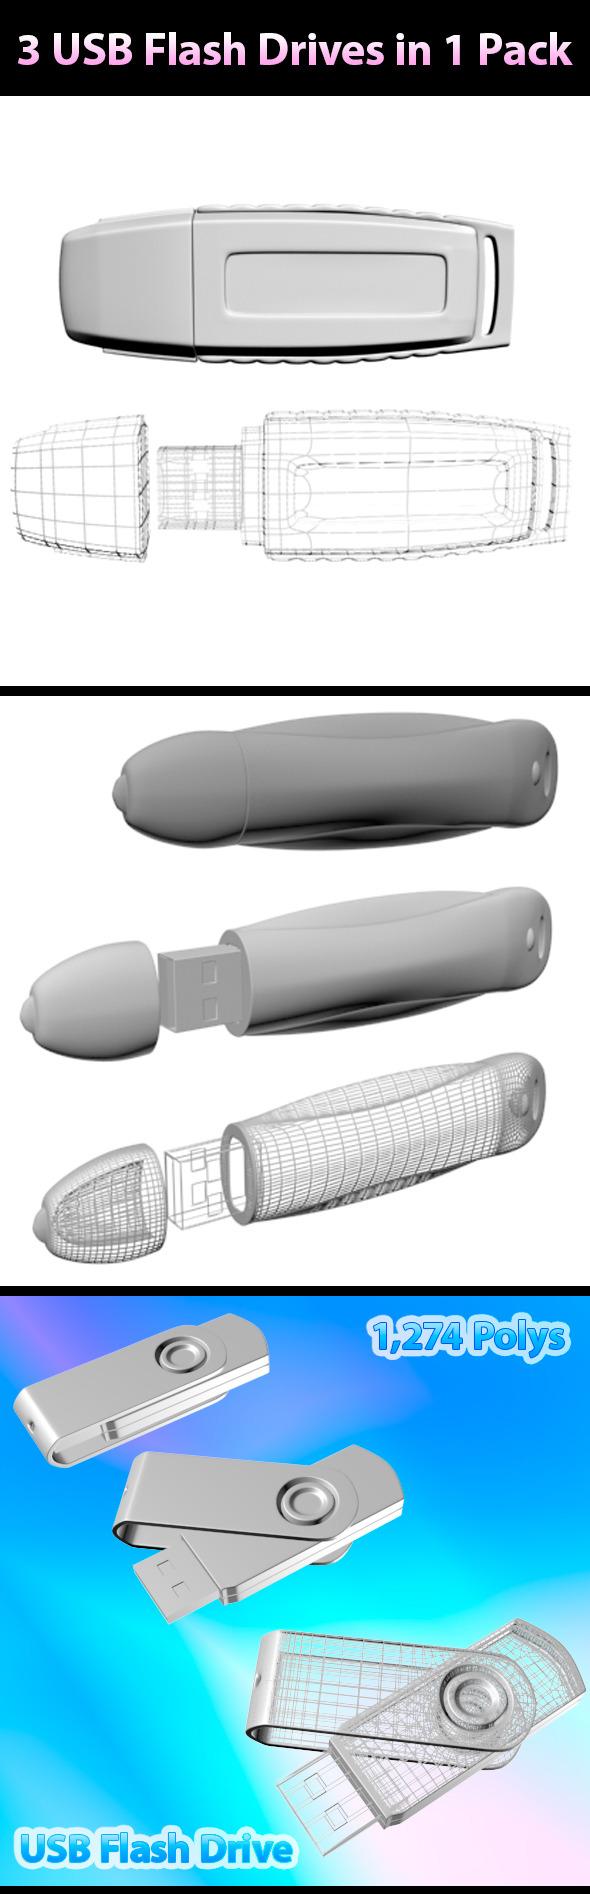 USB Flash Drives - Pack 01 - 3DOcean Item for Sale